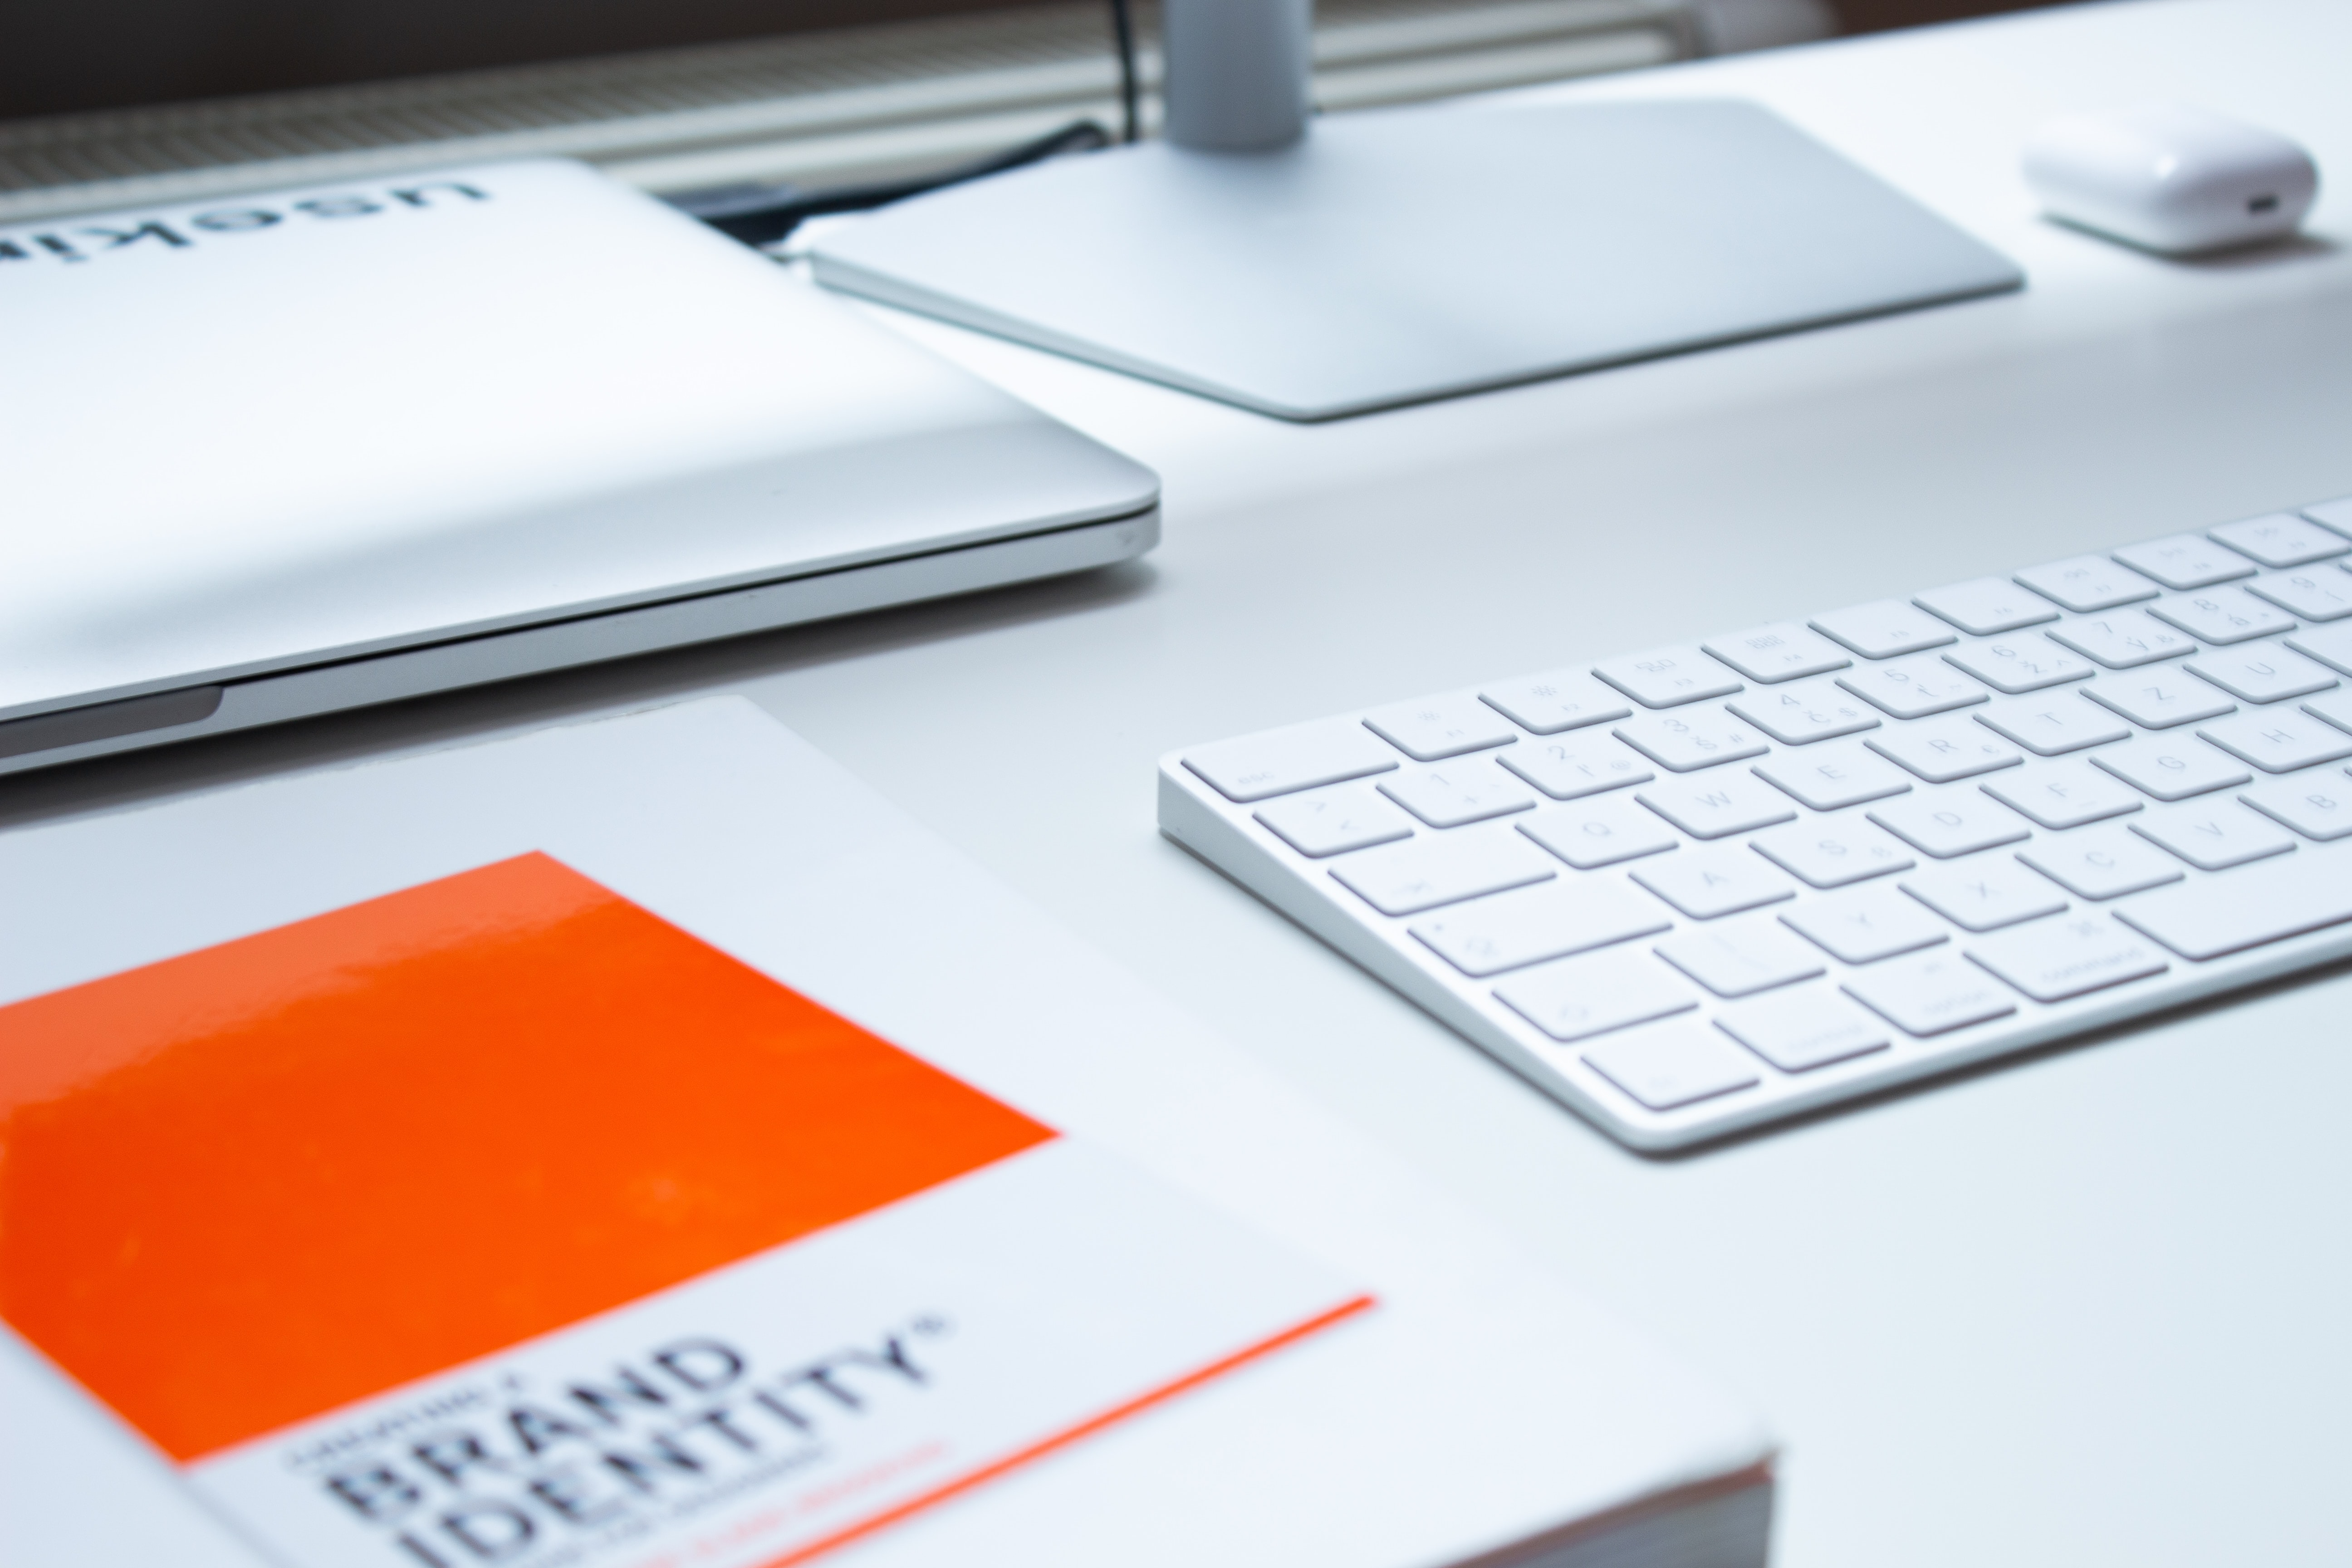 Brand Identity book on desk